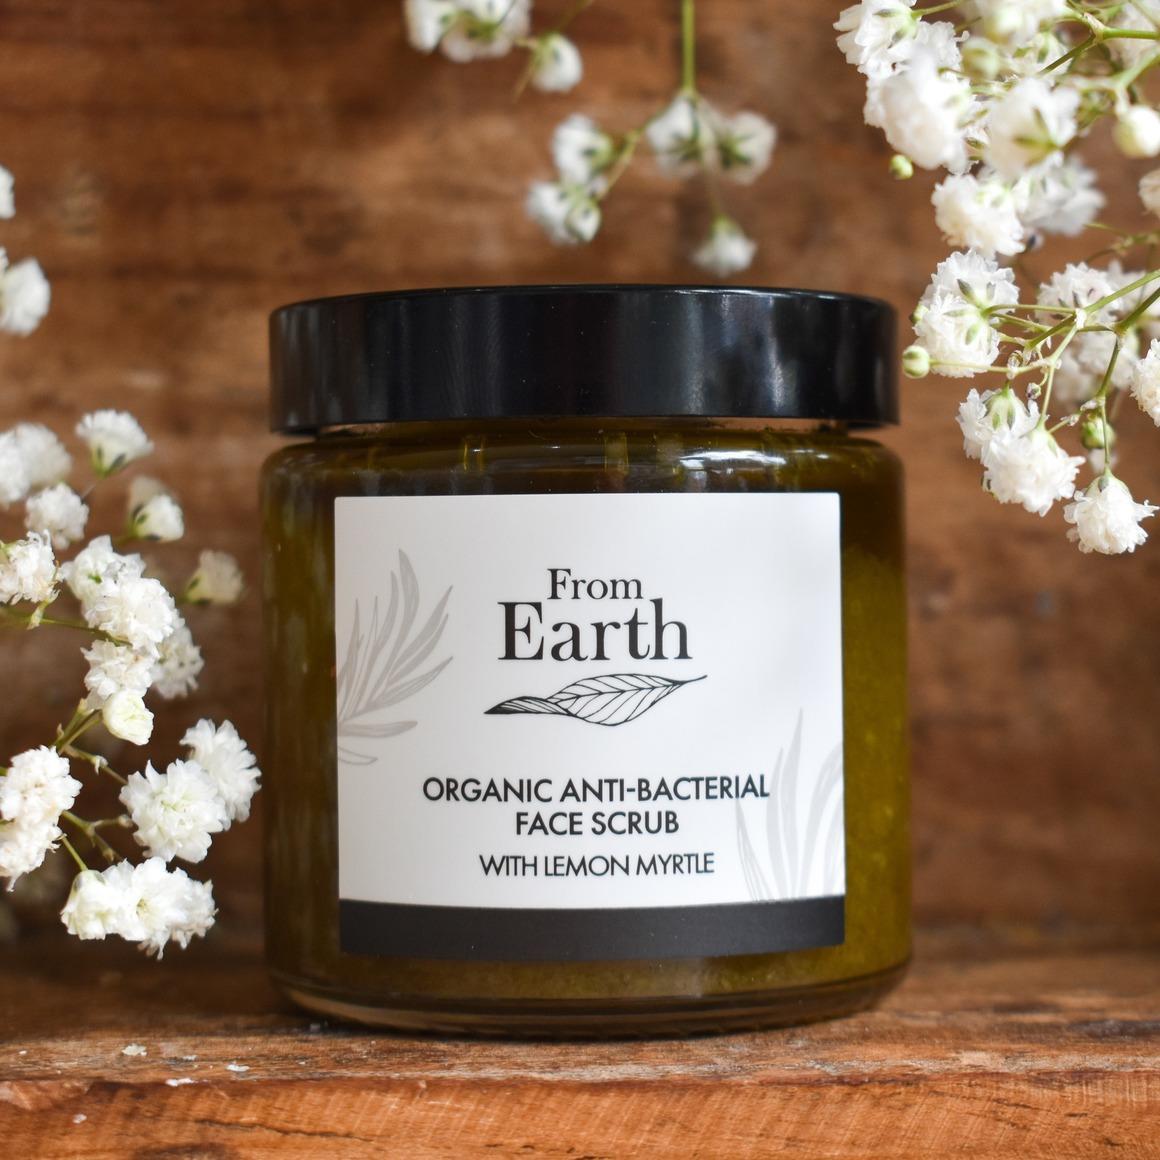 Organic Anti-Bacterial Face Scrub - With Lemon Myrtle   Trada Marketplace